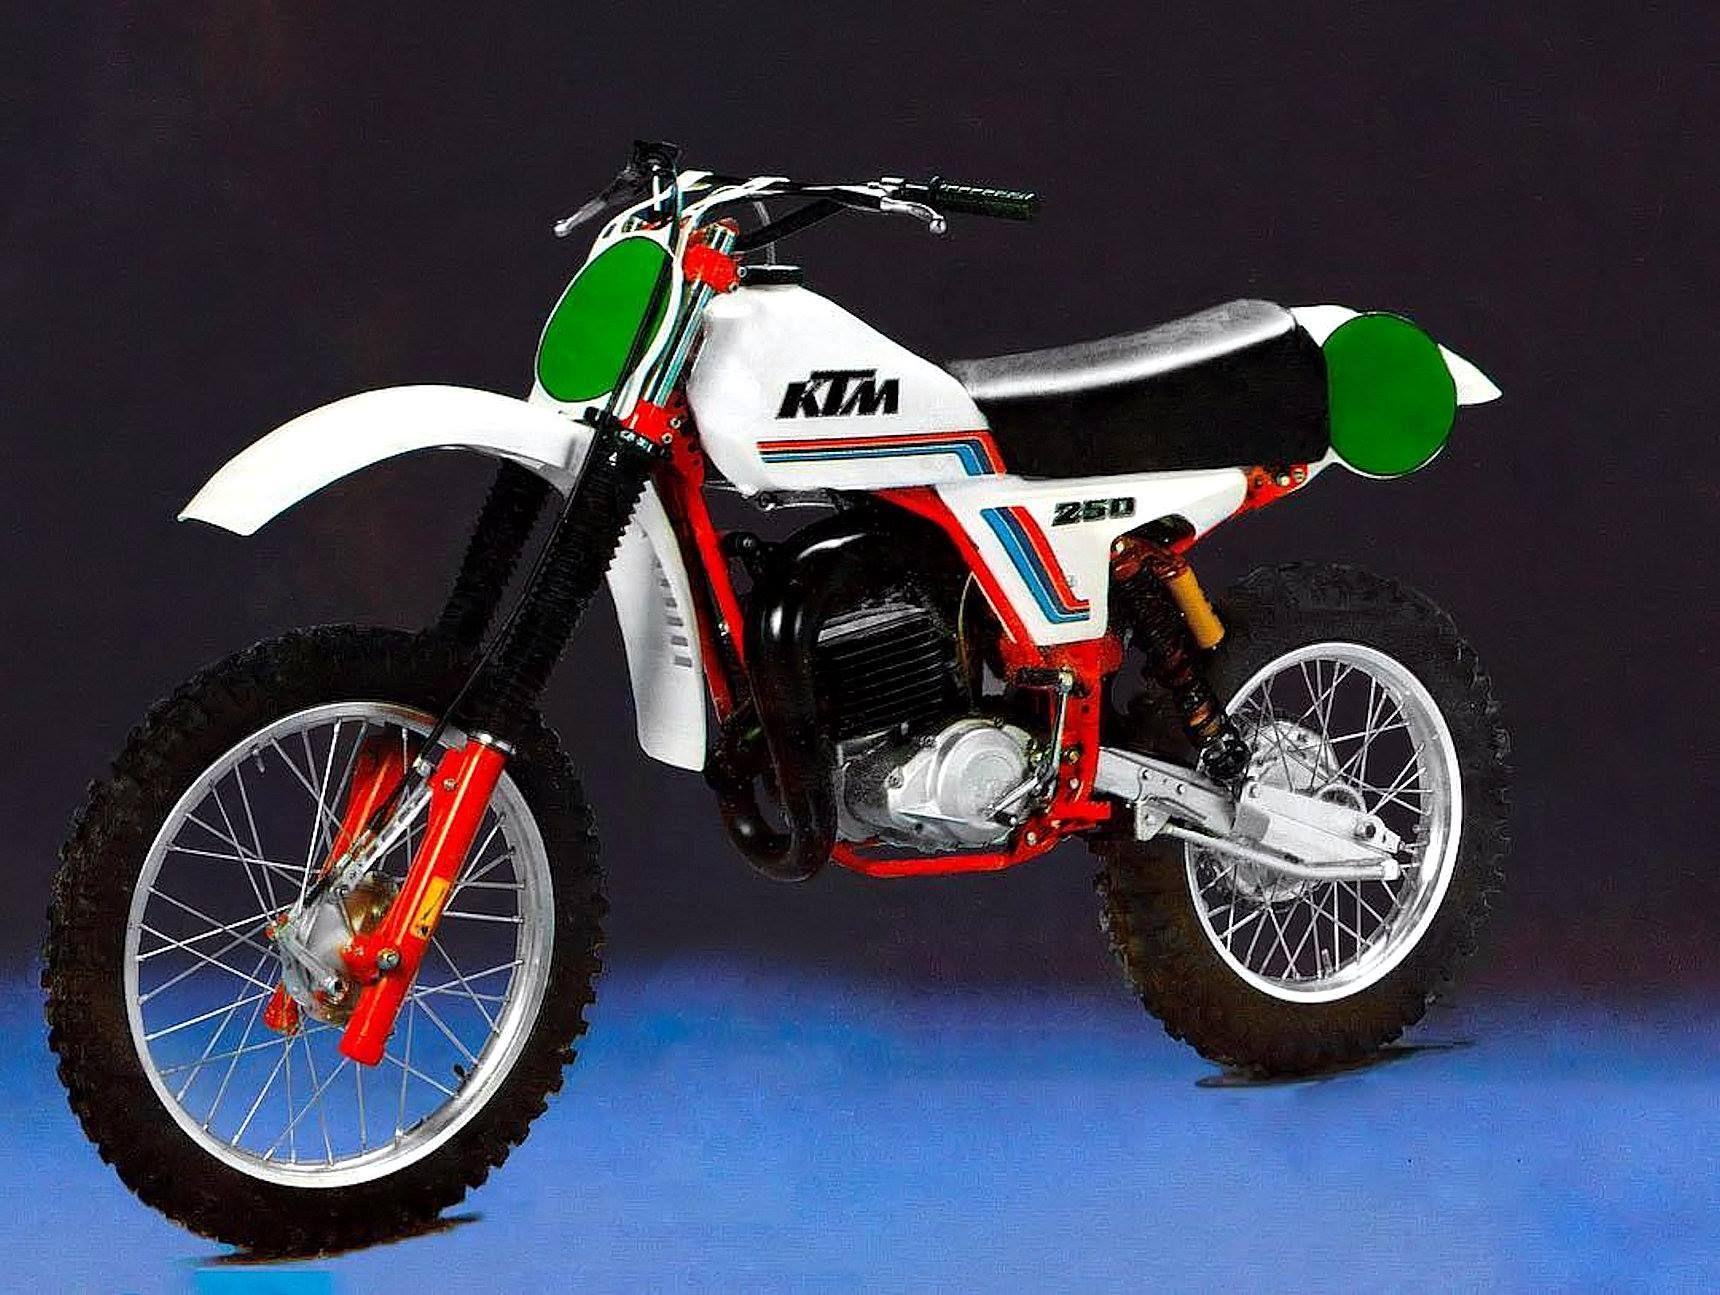 Ktm 250 Mc 1981 Vintage Motocross Motocross Bikes Ktm